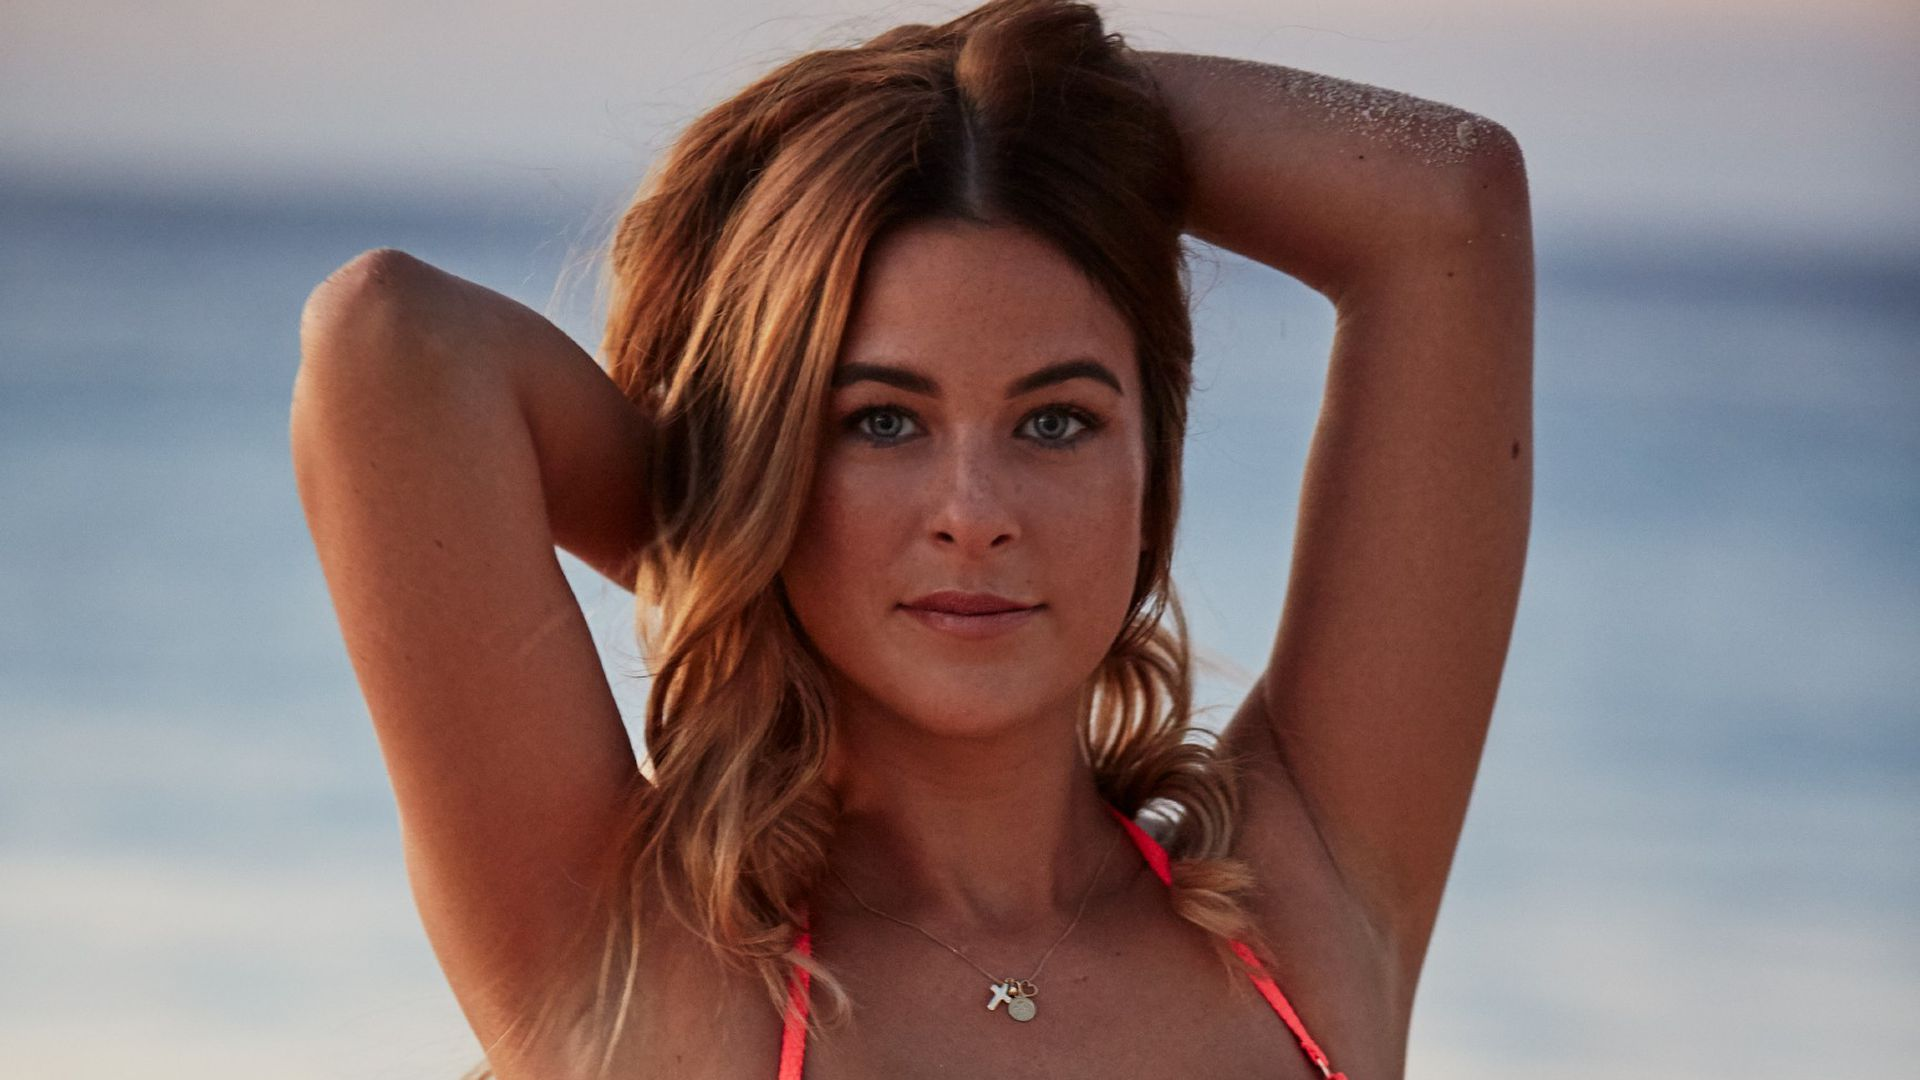 Nadine Bachelor 2019